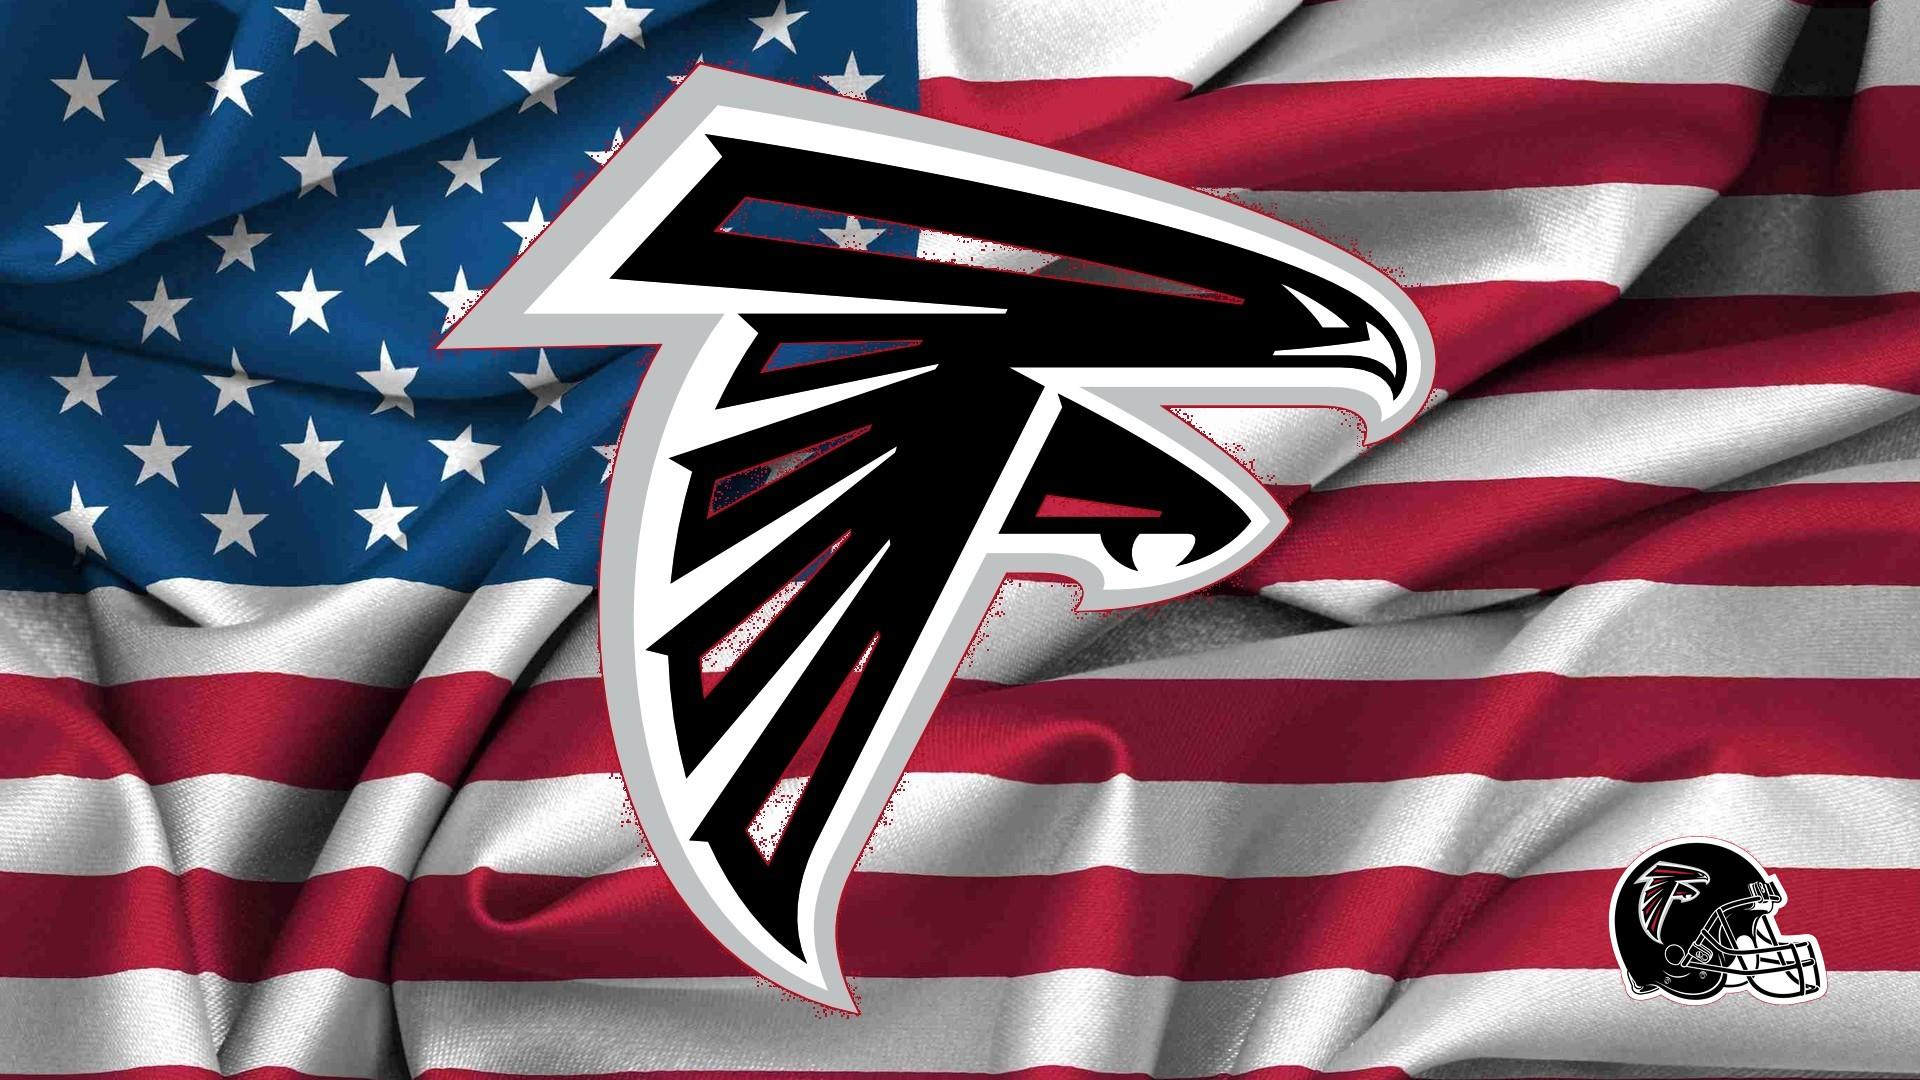 2017 <b>Atlanta Falcons Wallpapers</b> - PC |iPhone| Android